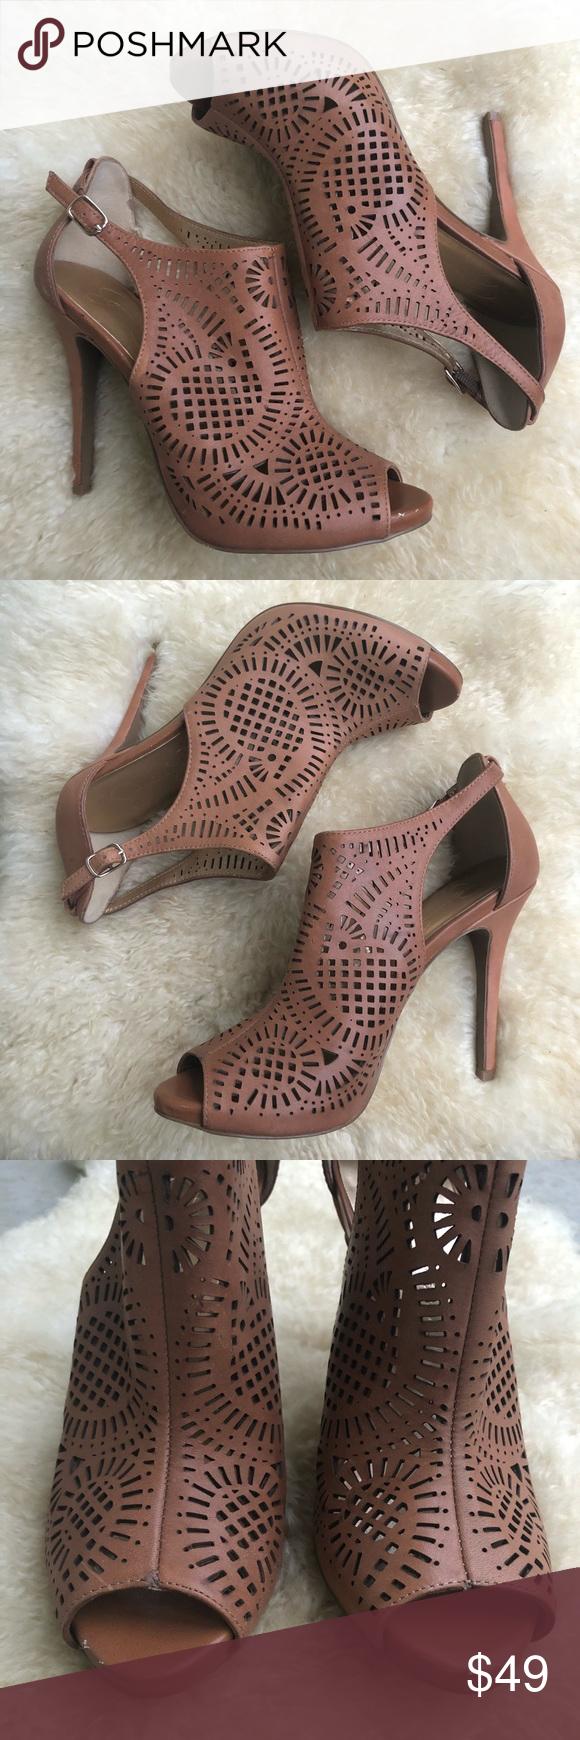 ccd7092d07 Jessica Simpson Arabel laser cutout peep toe heels Laser cut cage ...